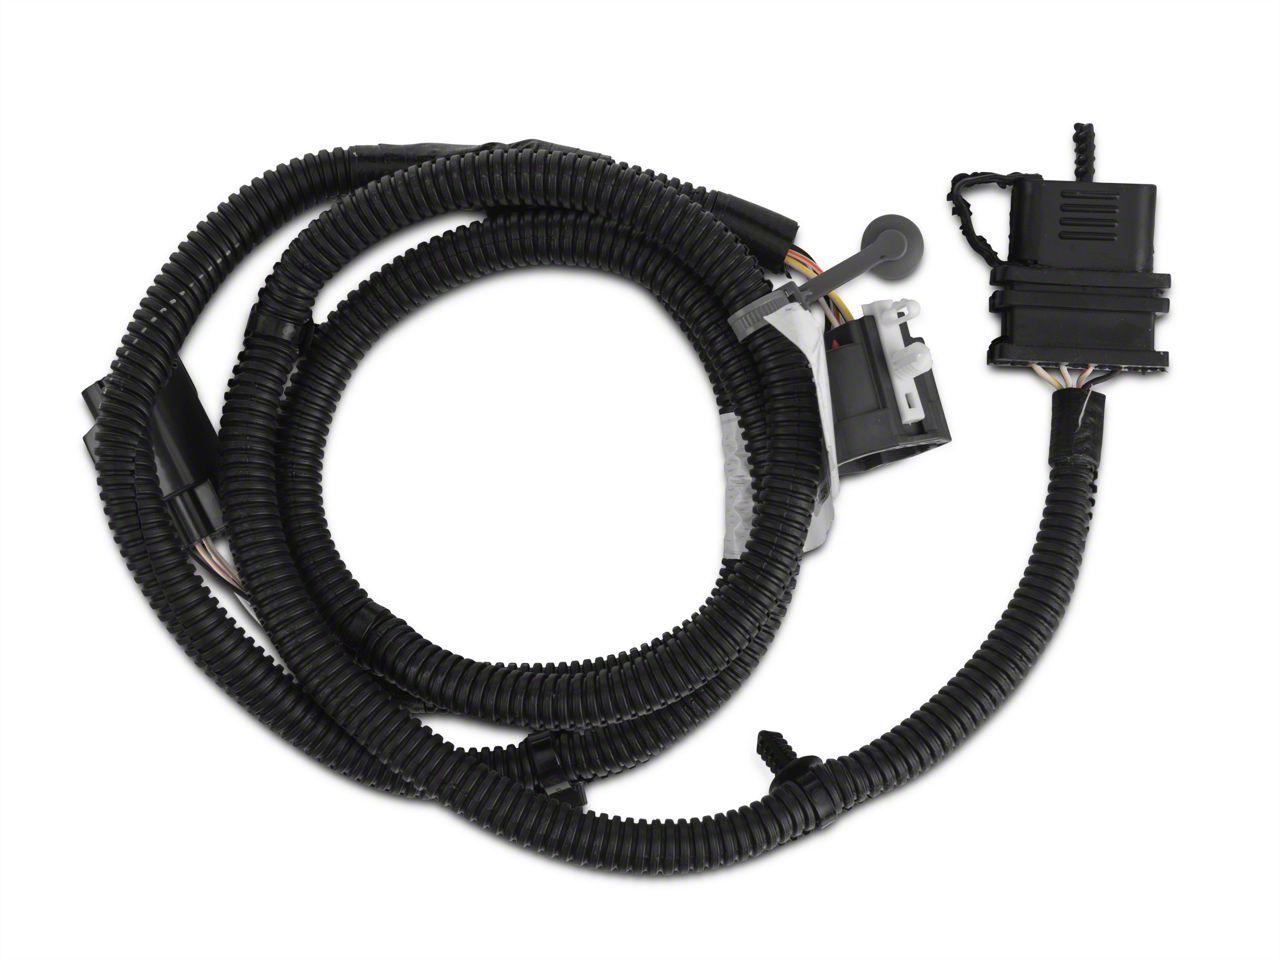 jeep patriot trailer wiring harness | wiring diagram on jeep wiring  harness diagram, jeep patriot